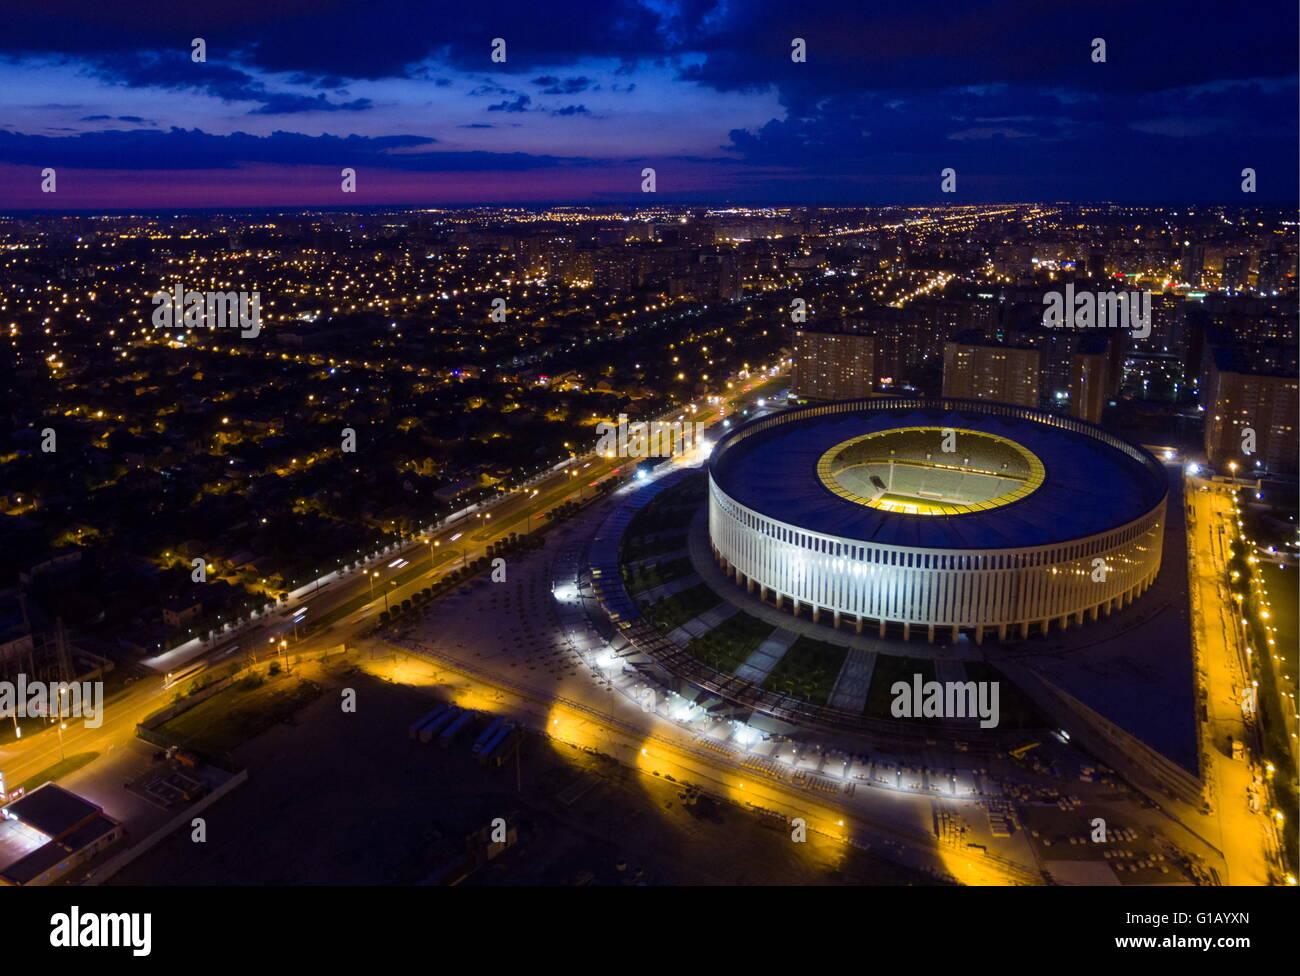 KRASNODAR, RUSSIE. Le 8 mai 2016. Une vue sur le stade de Krasnodar. Vitaly Timkiv/TASS Photo Stock